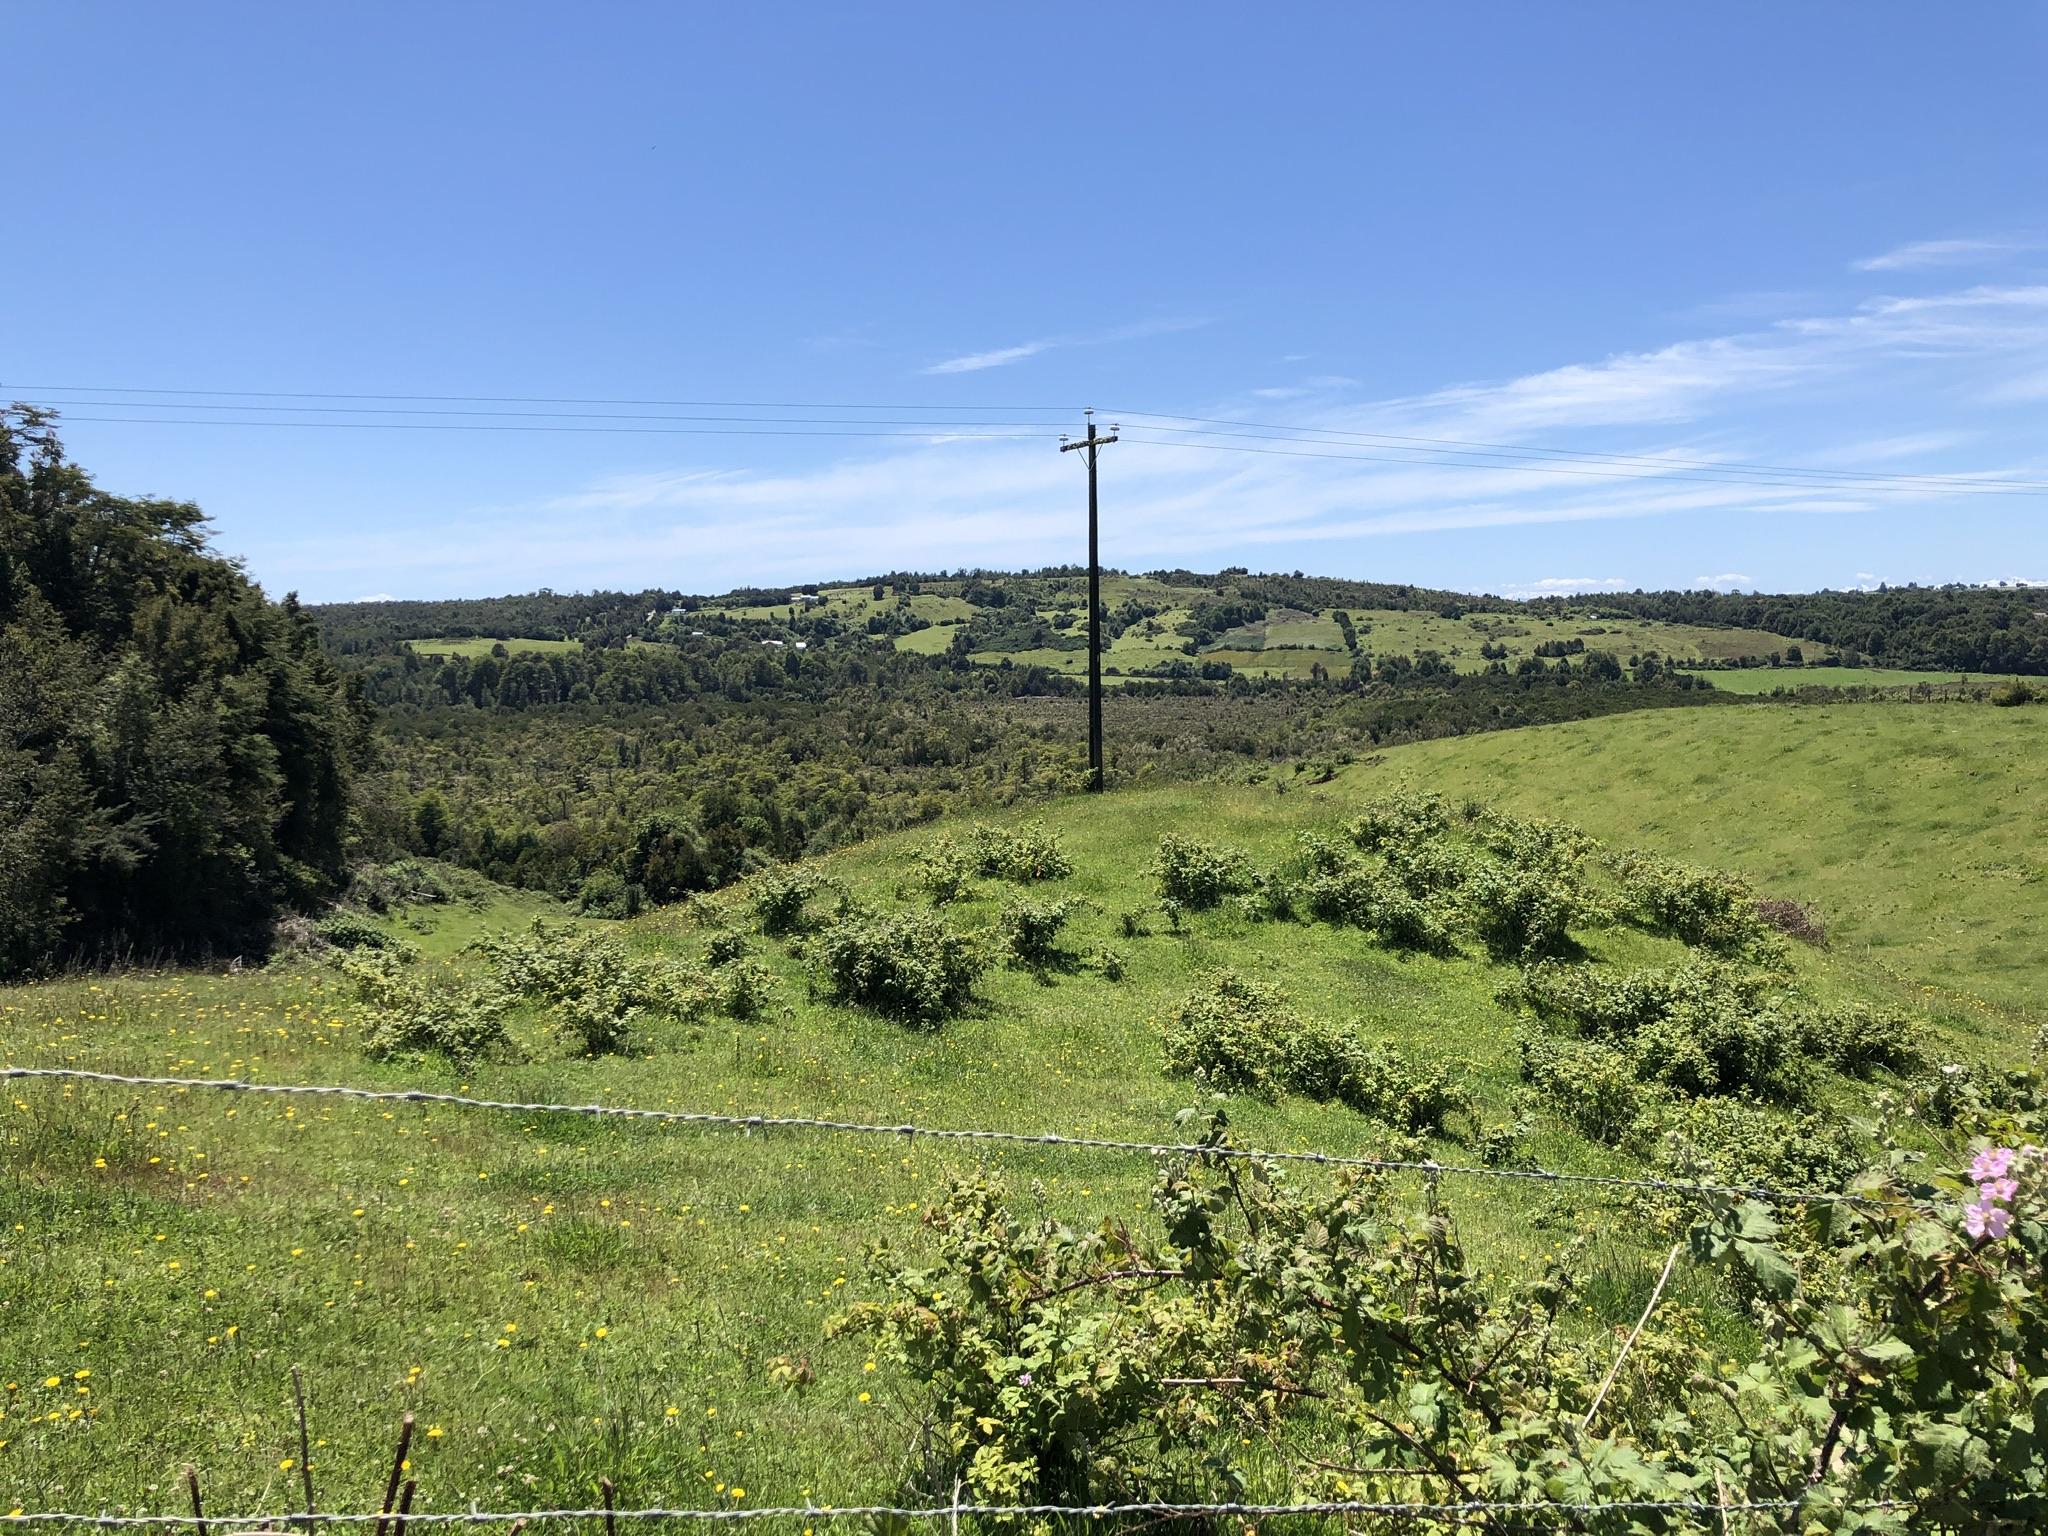 Puerto Montt, Insel Chiloé, Fähre, Coyhaique, Dorf: Perito Moreno, Gregores